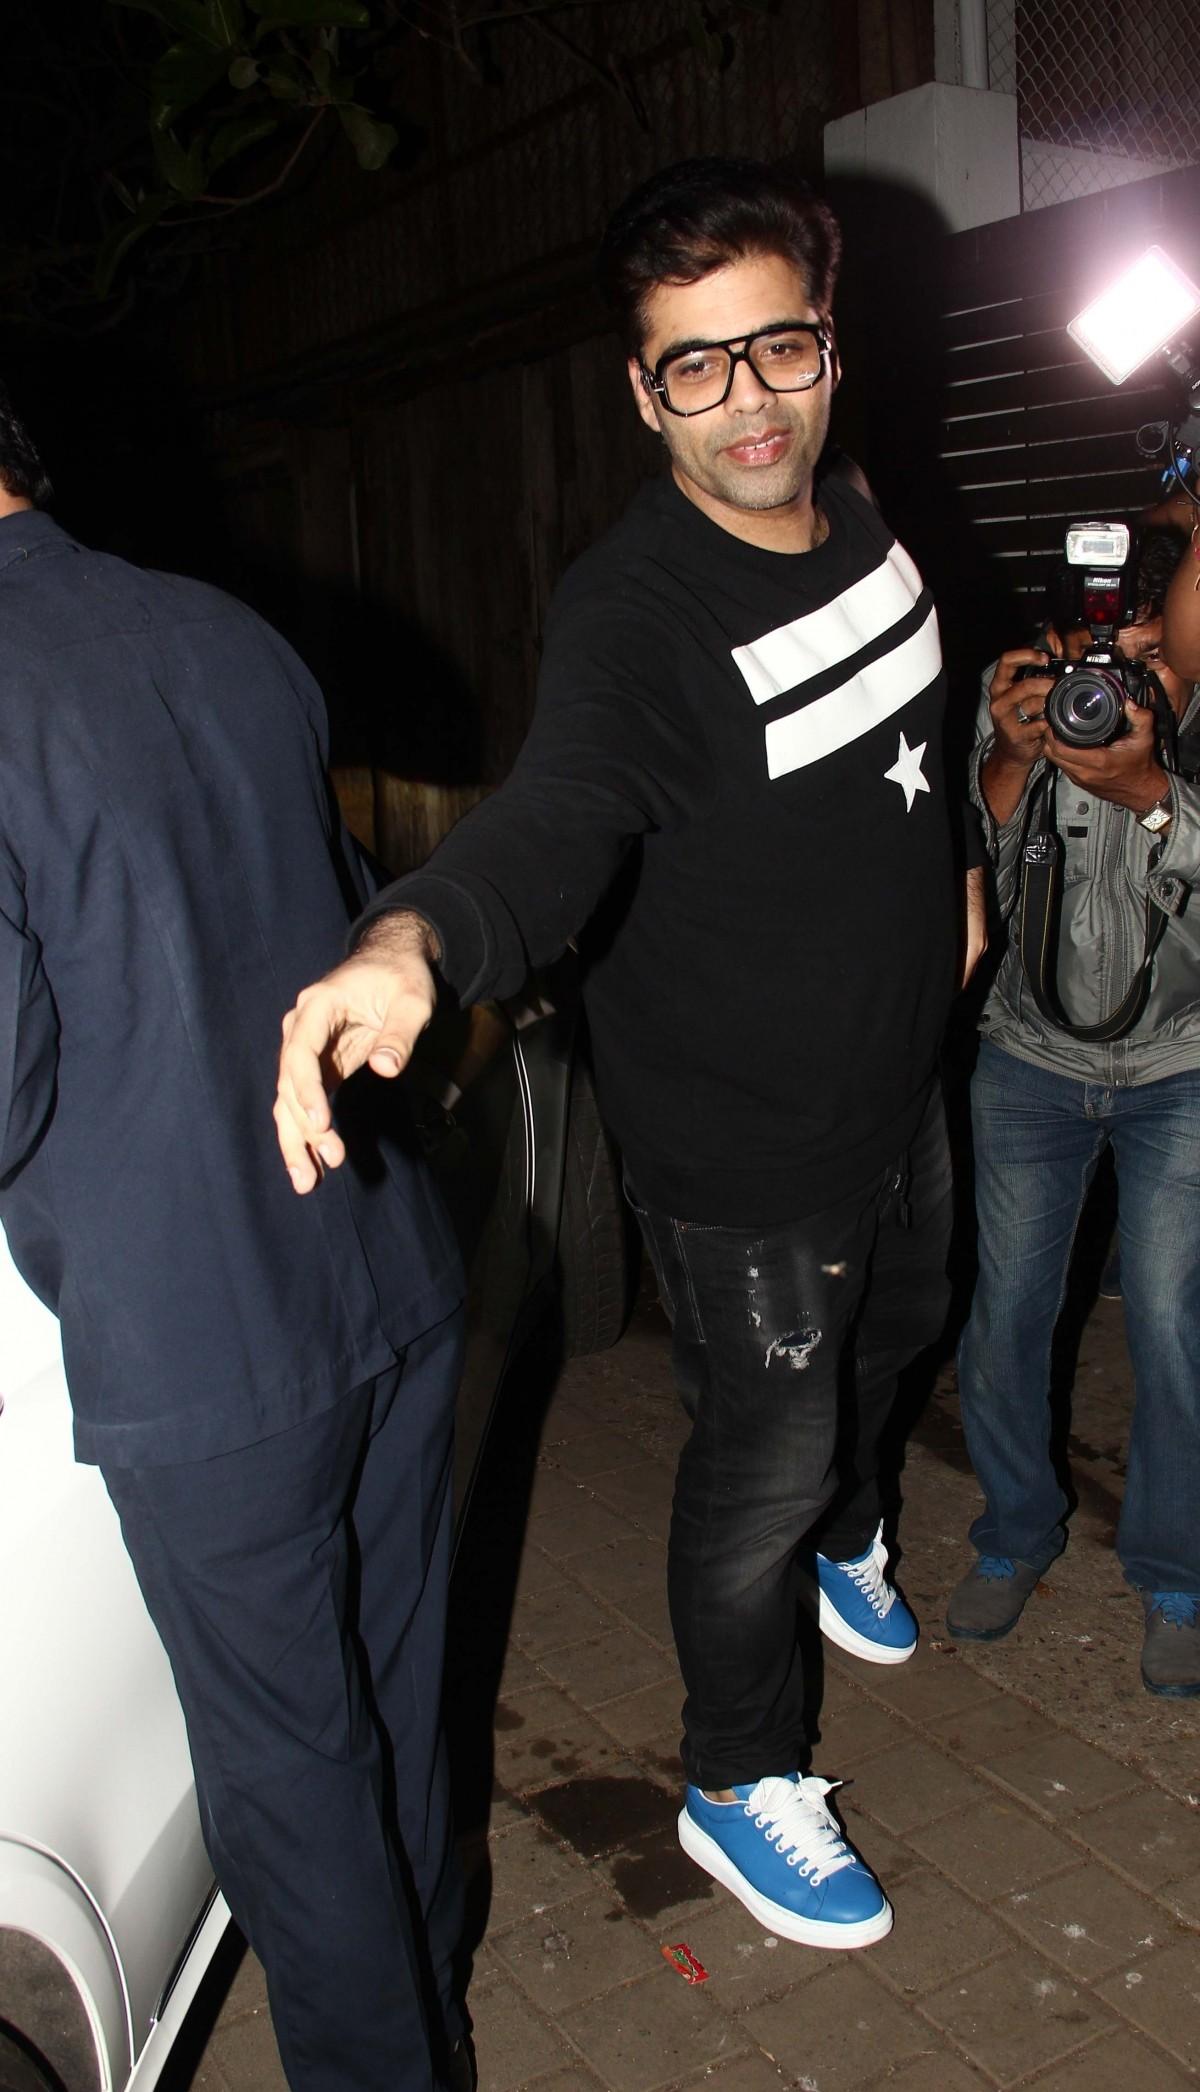 Kareena Kapoor Khan, Karan Johar, Jacqueline Fernandez Spotted At Zoya Akhtar's House Party